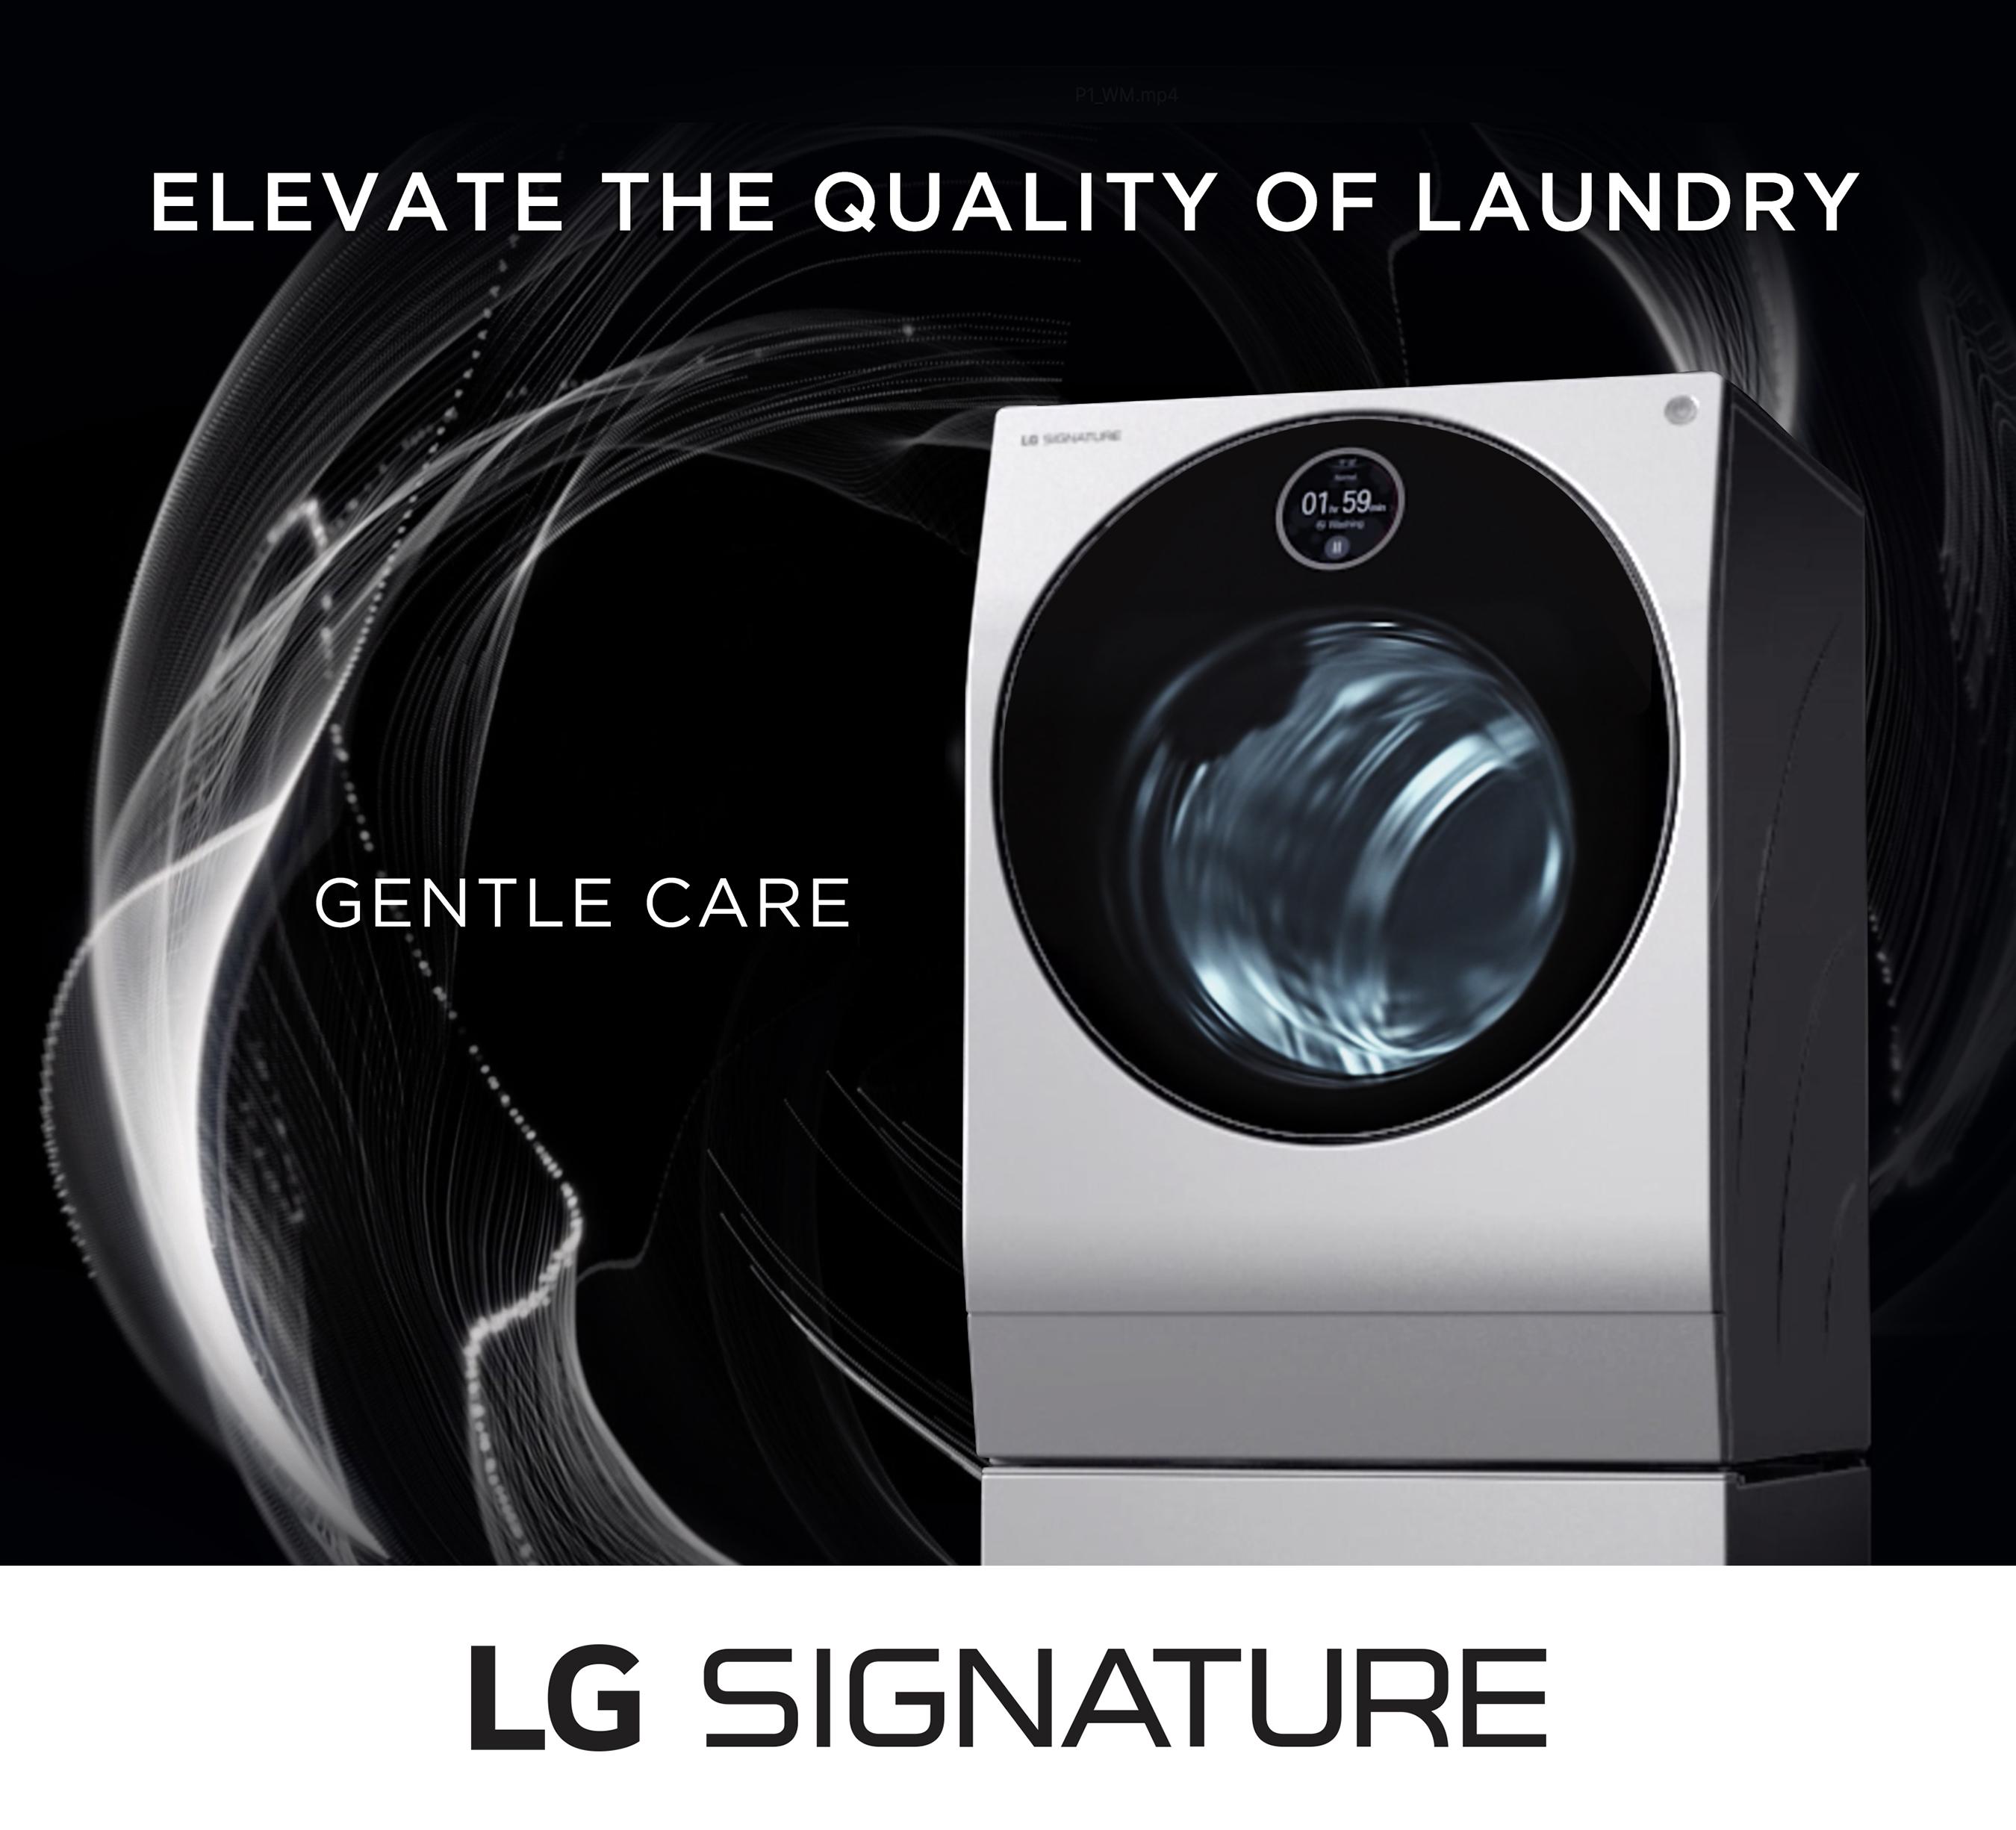 LG SIGNATURE Digital Ad-Washer